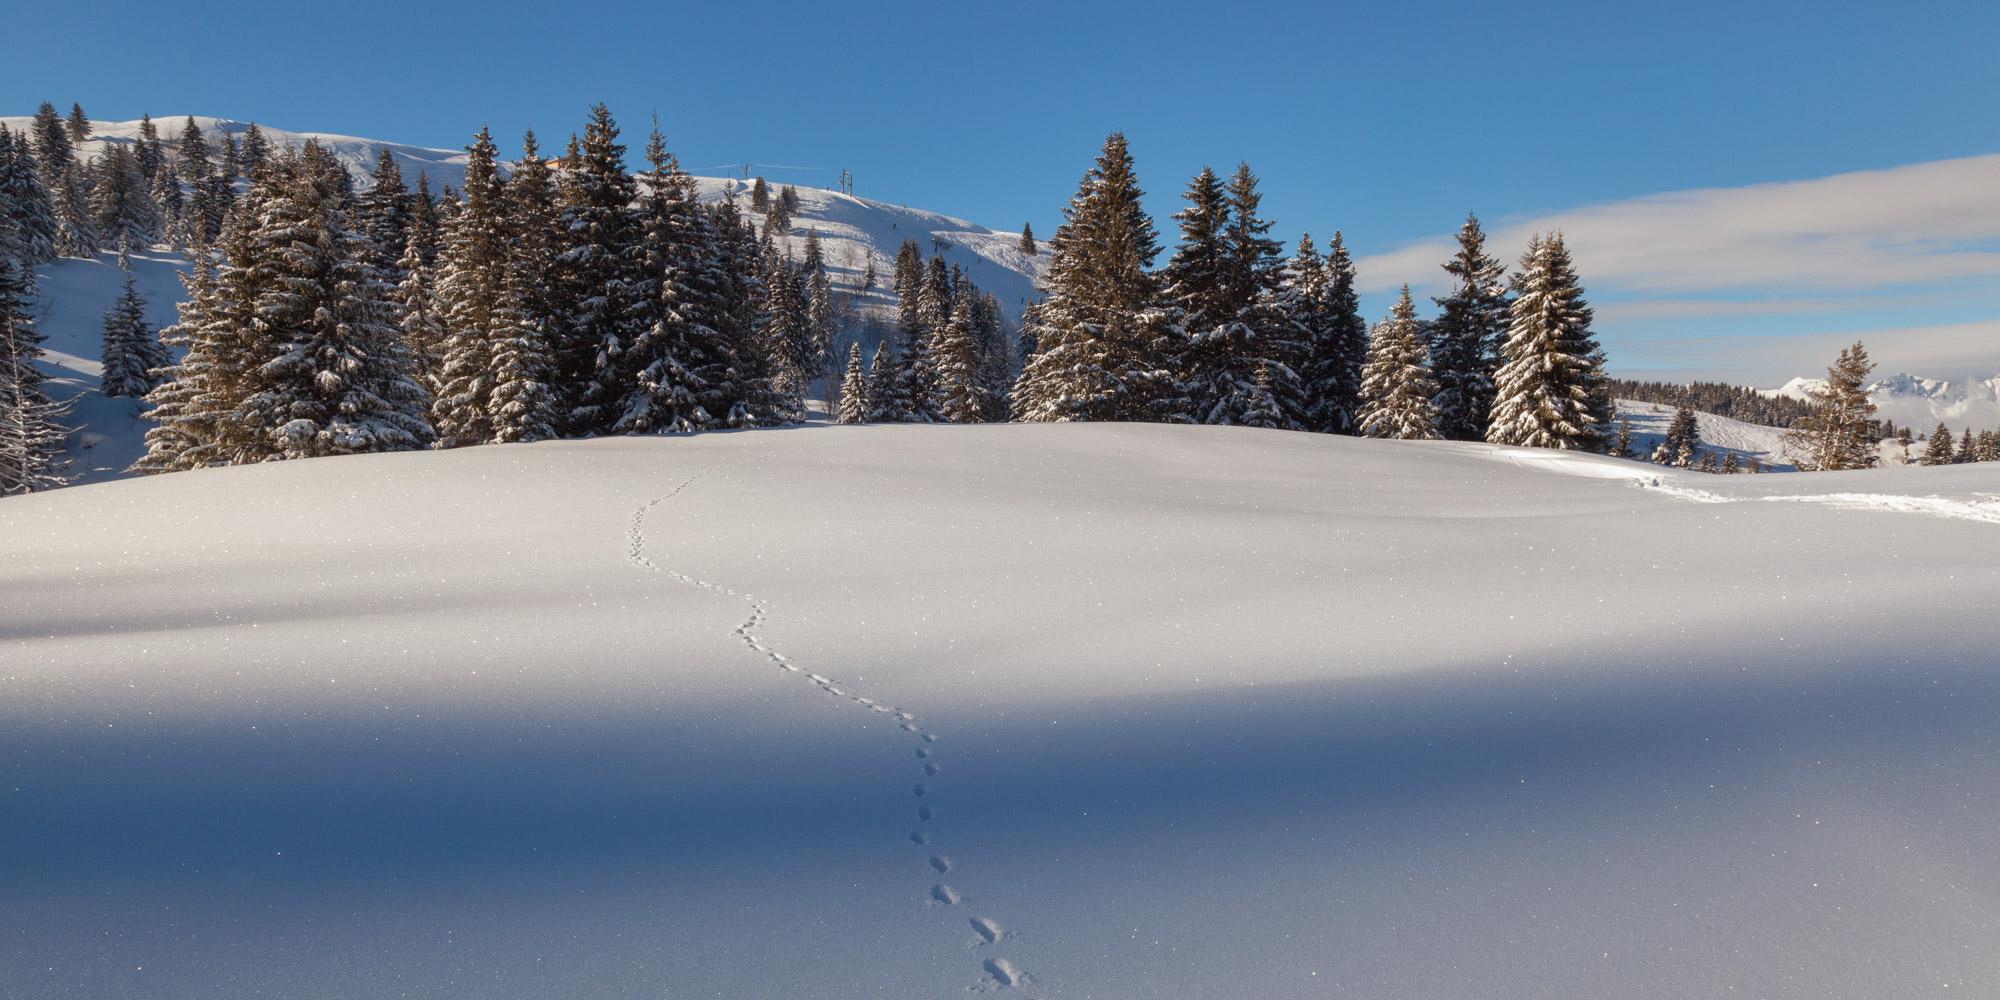 Untouched Snow near Megeve Ski Resort, France